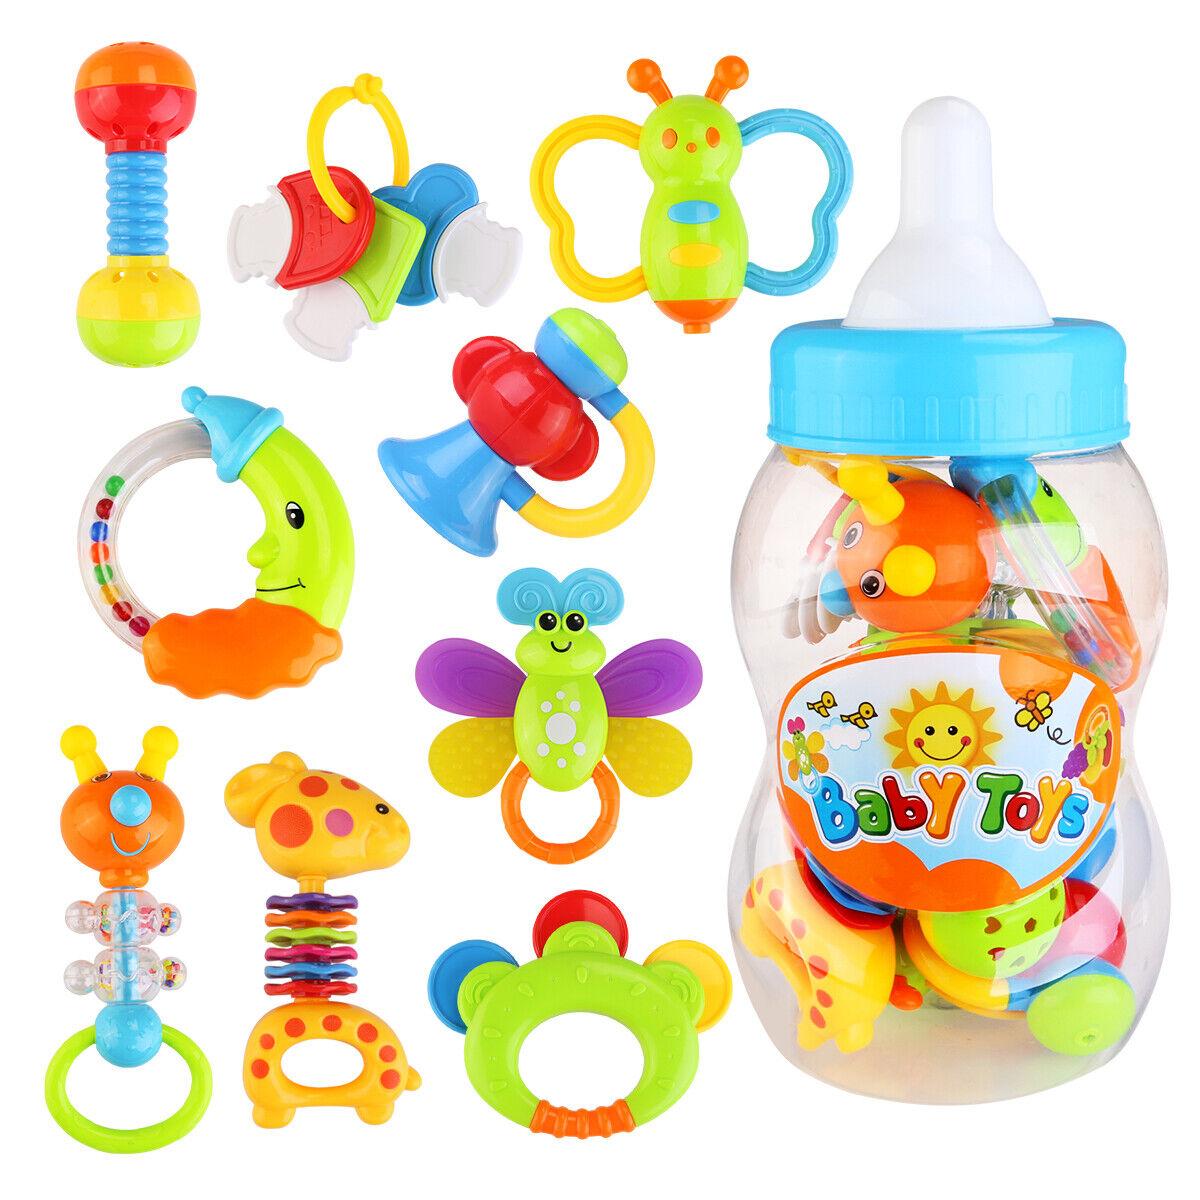 9stk 0-1 Jahre alt Baby Spielzeug Motorik Rasseln Greiflinge Rassel Babyrassel